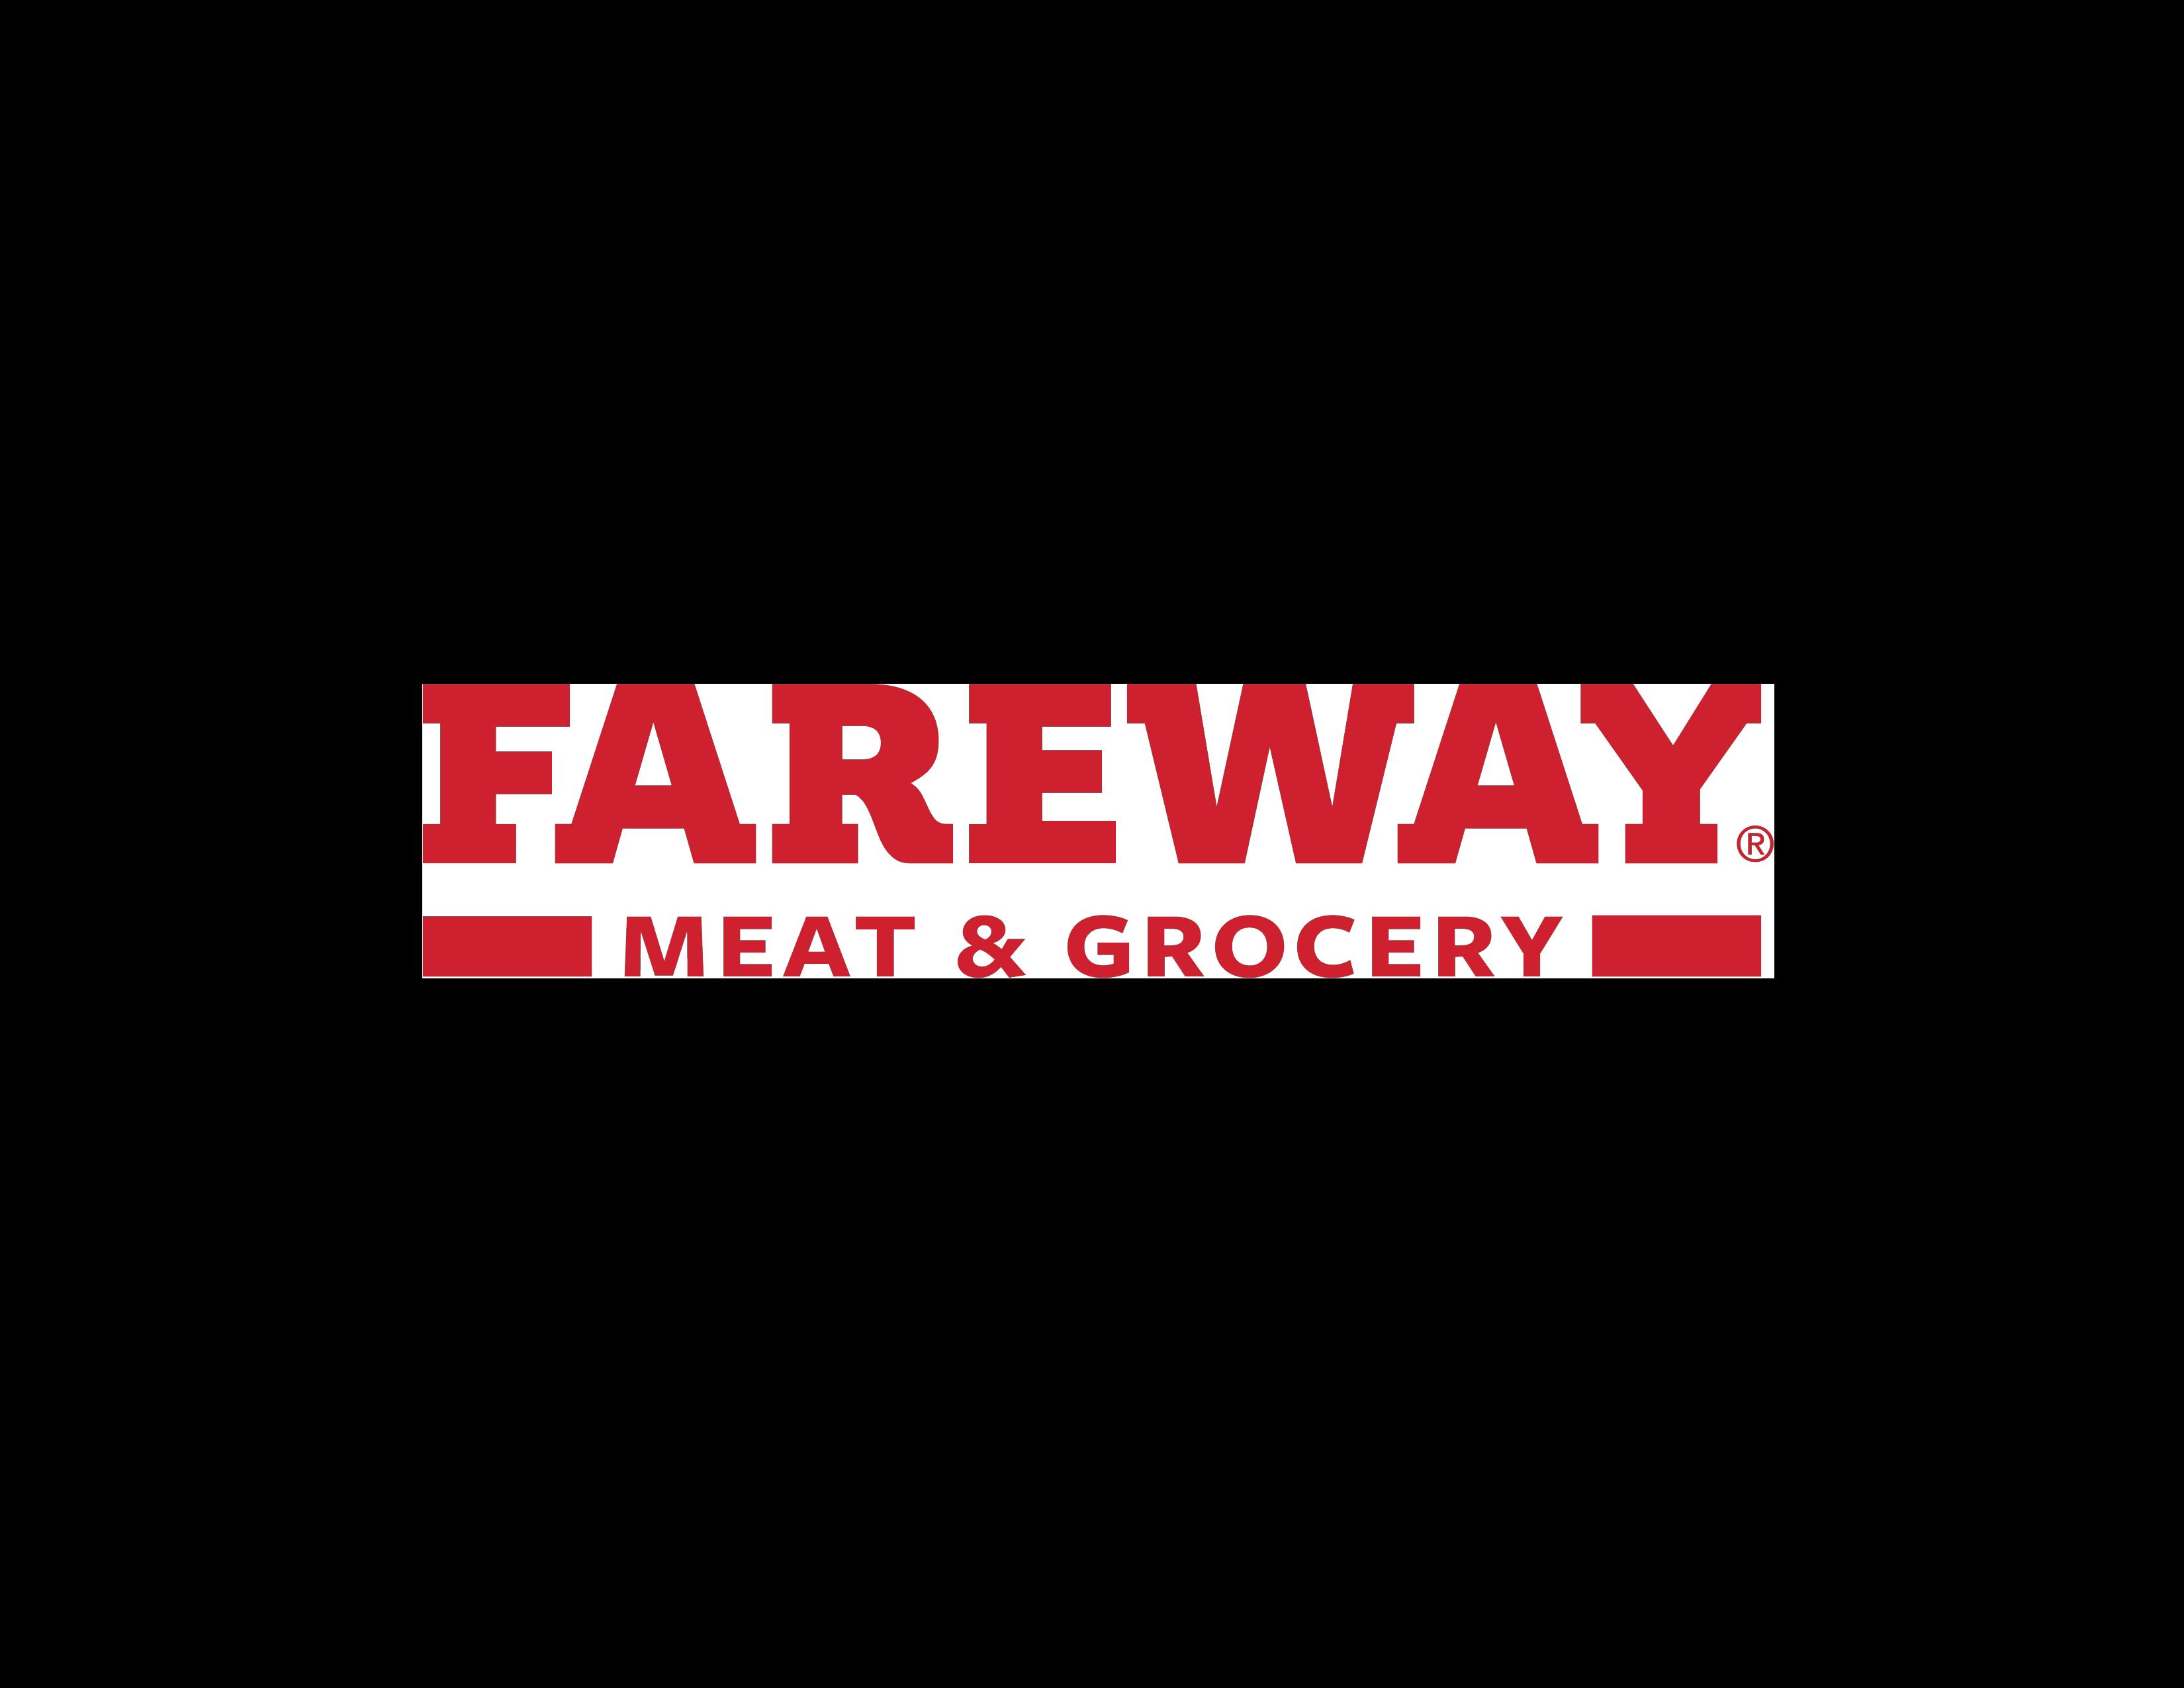 Employee Center | Fareway